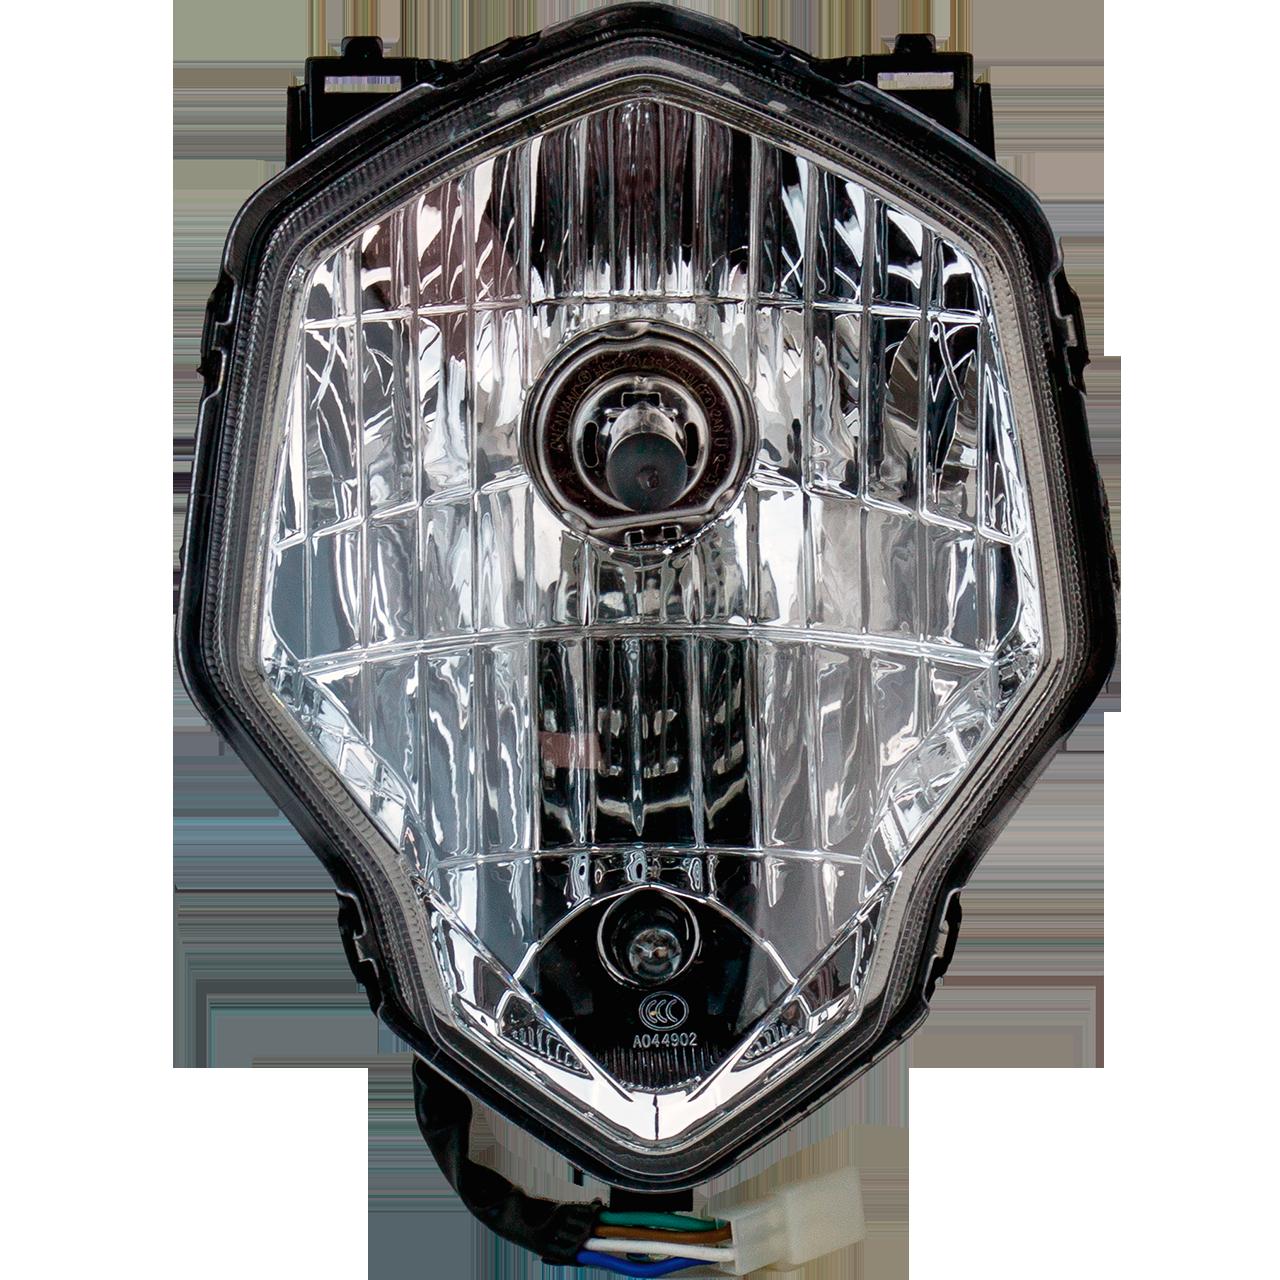 LX200GY-7A DS1 Фара передняя 12V 35/35W цоколь HS1 Loncin - 280350831-0001